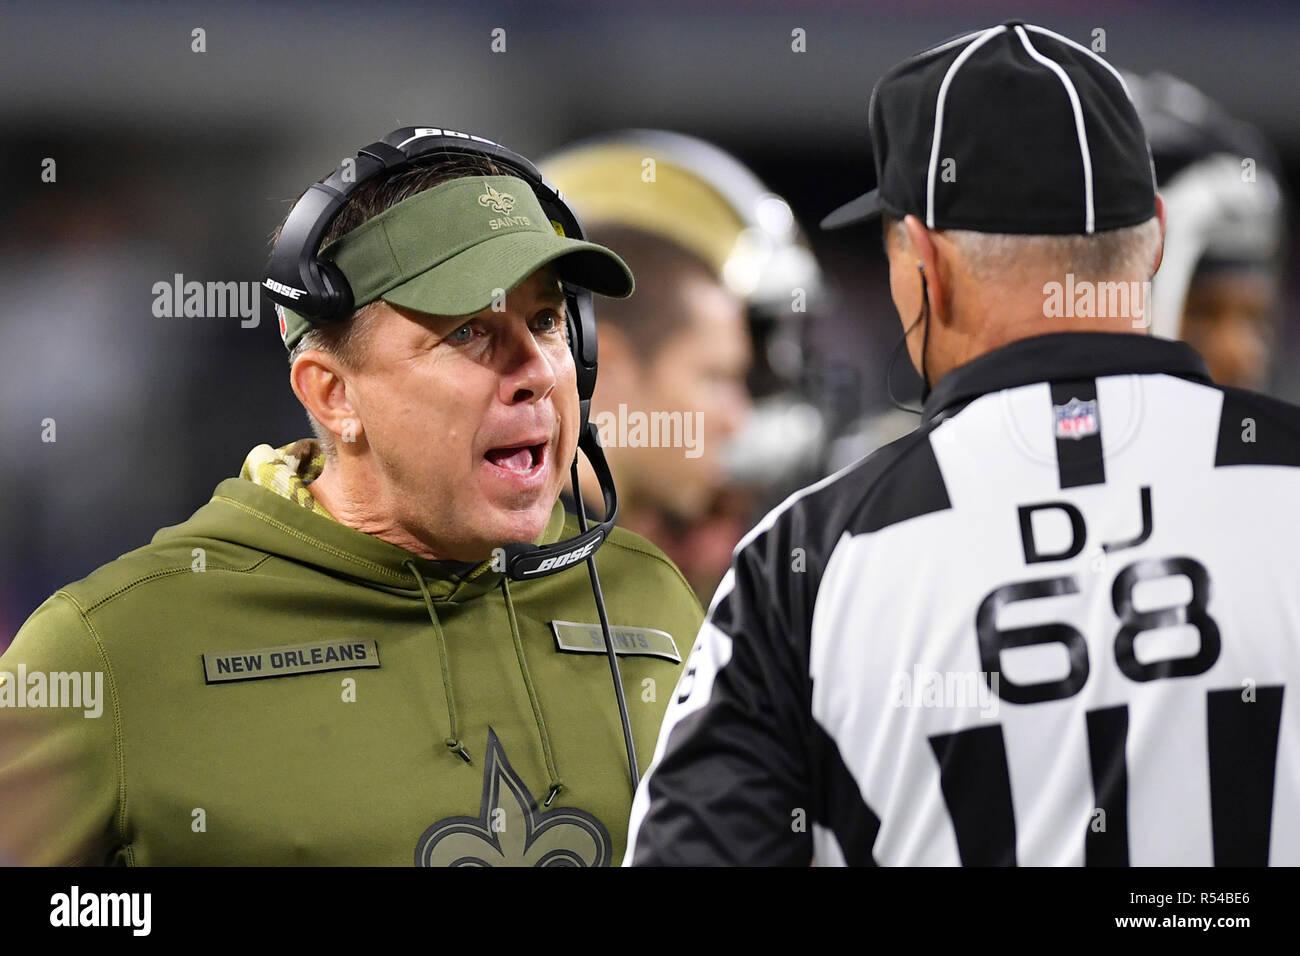 Arlington Texas Usa 29th Nov 2018 New Orleans Saints